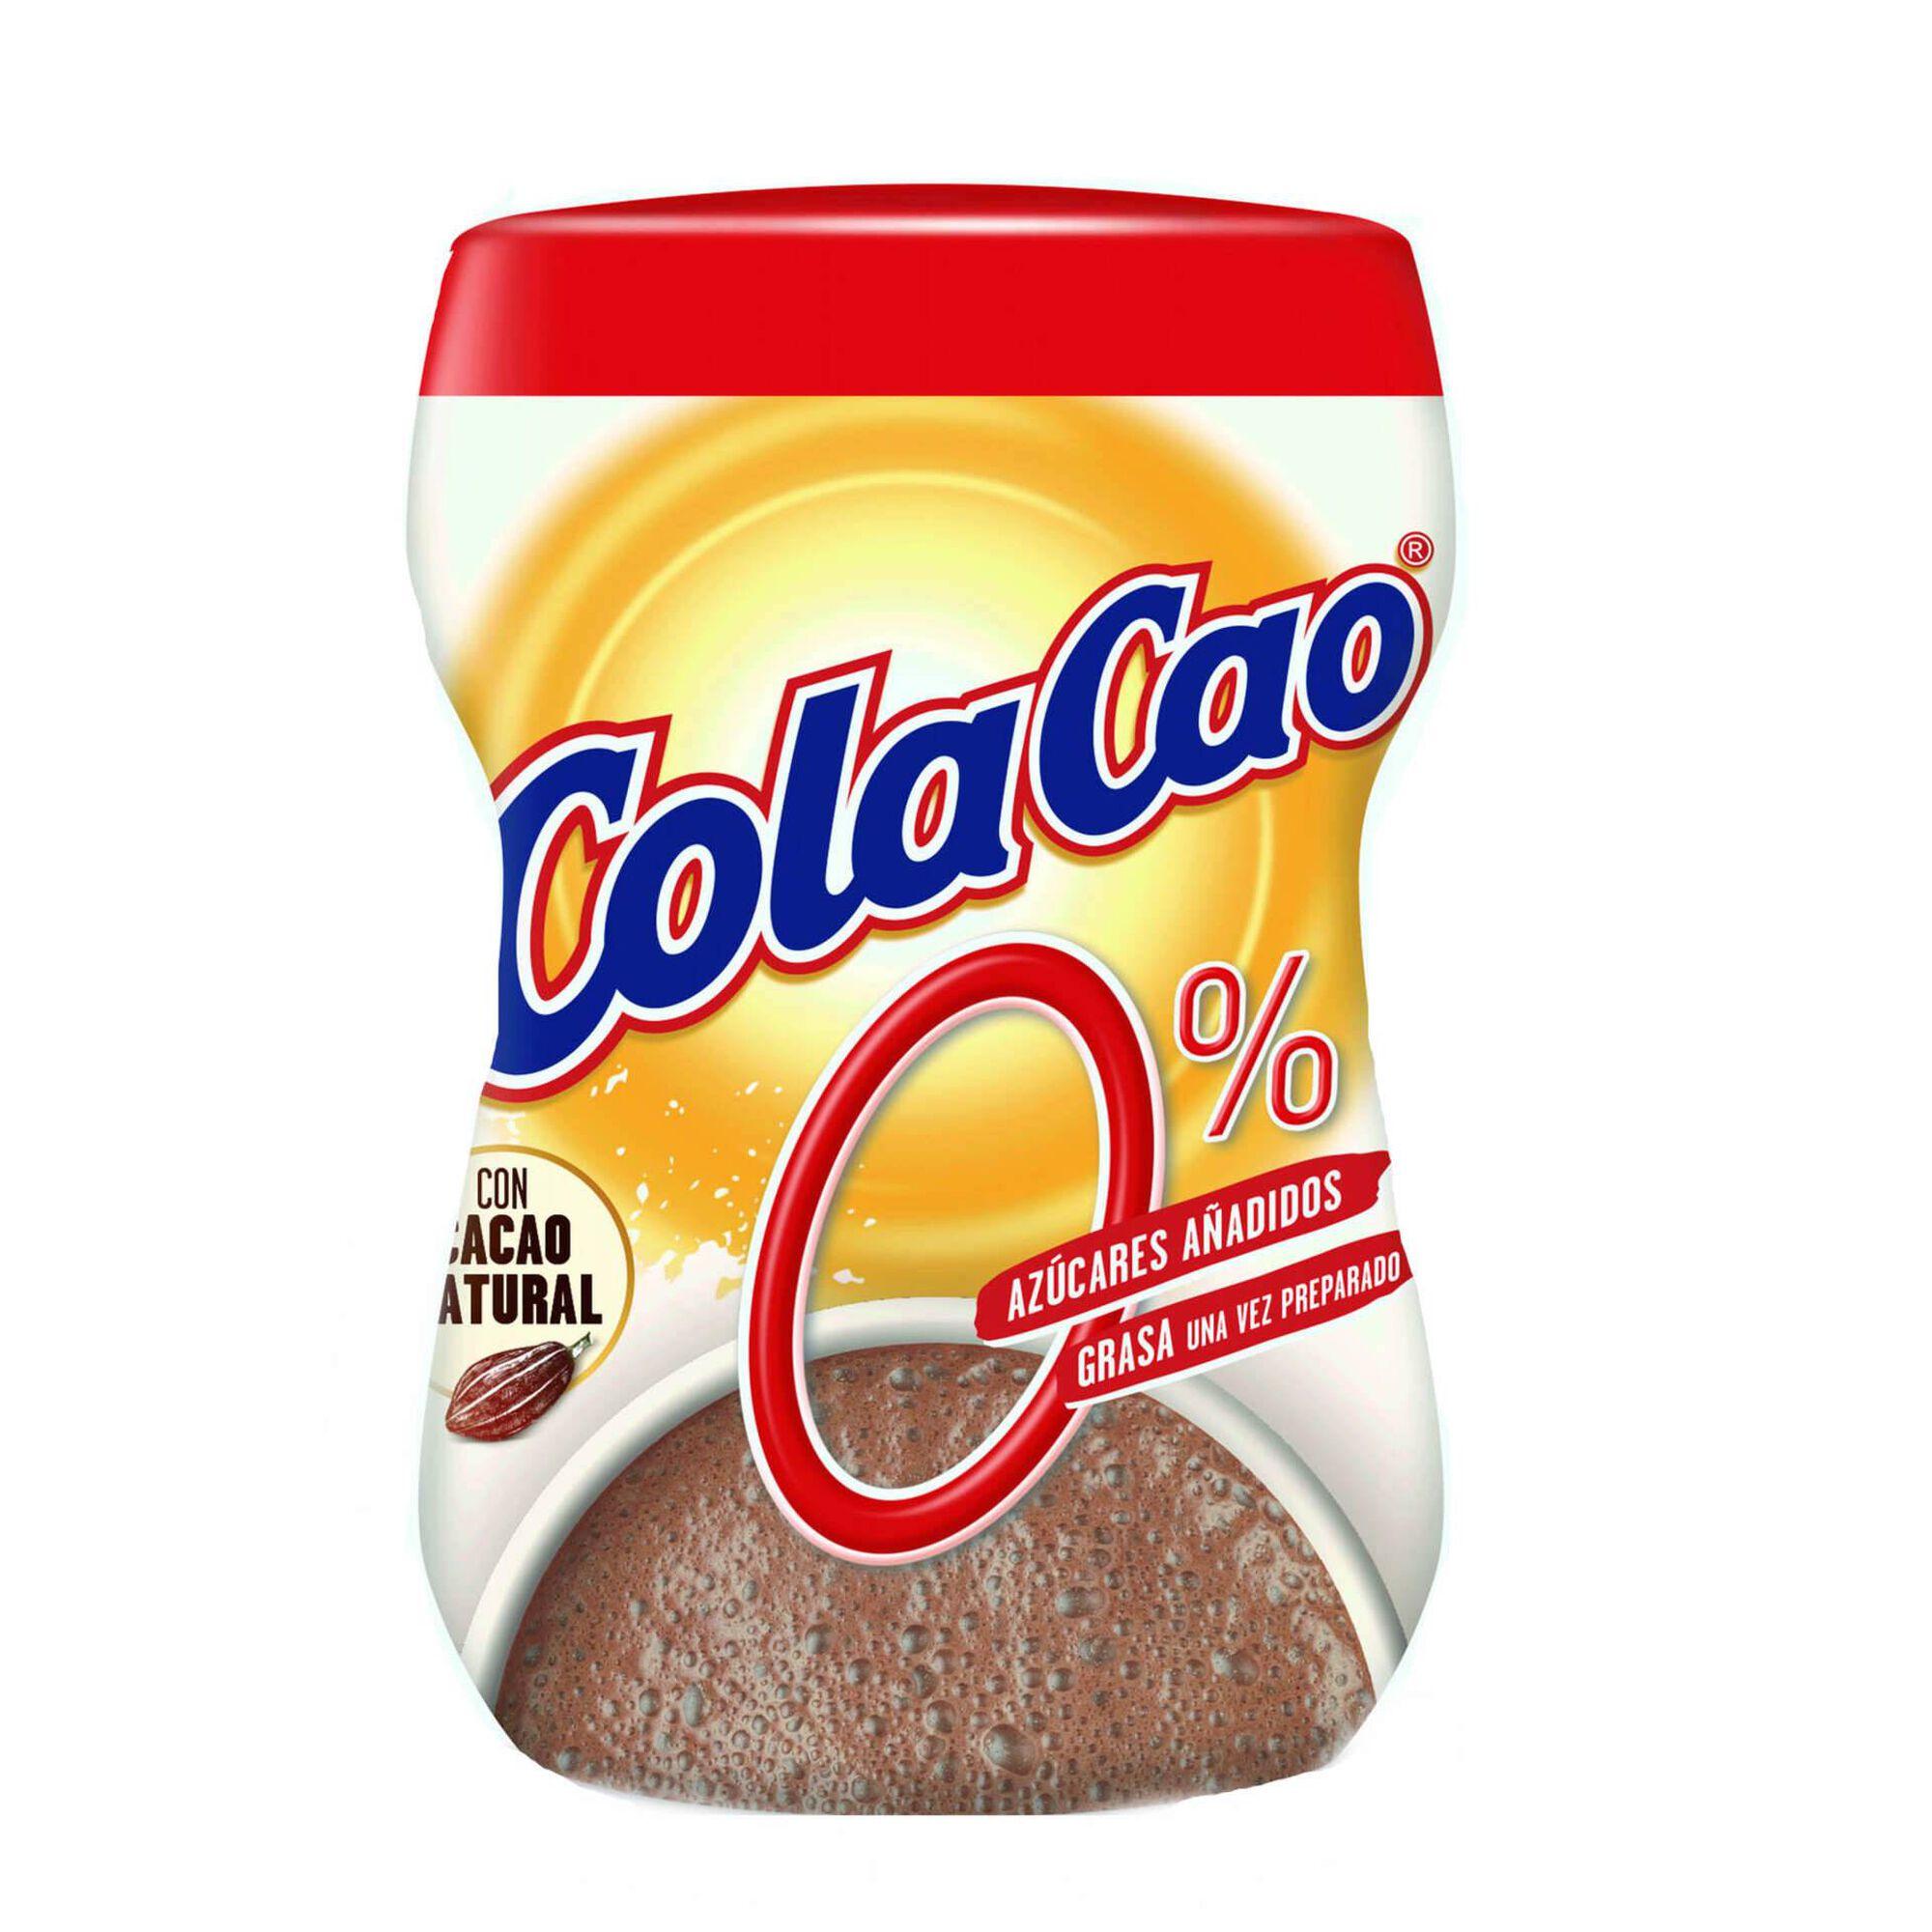 Achocolatado Solúvel sem Açúcar